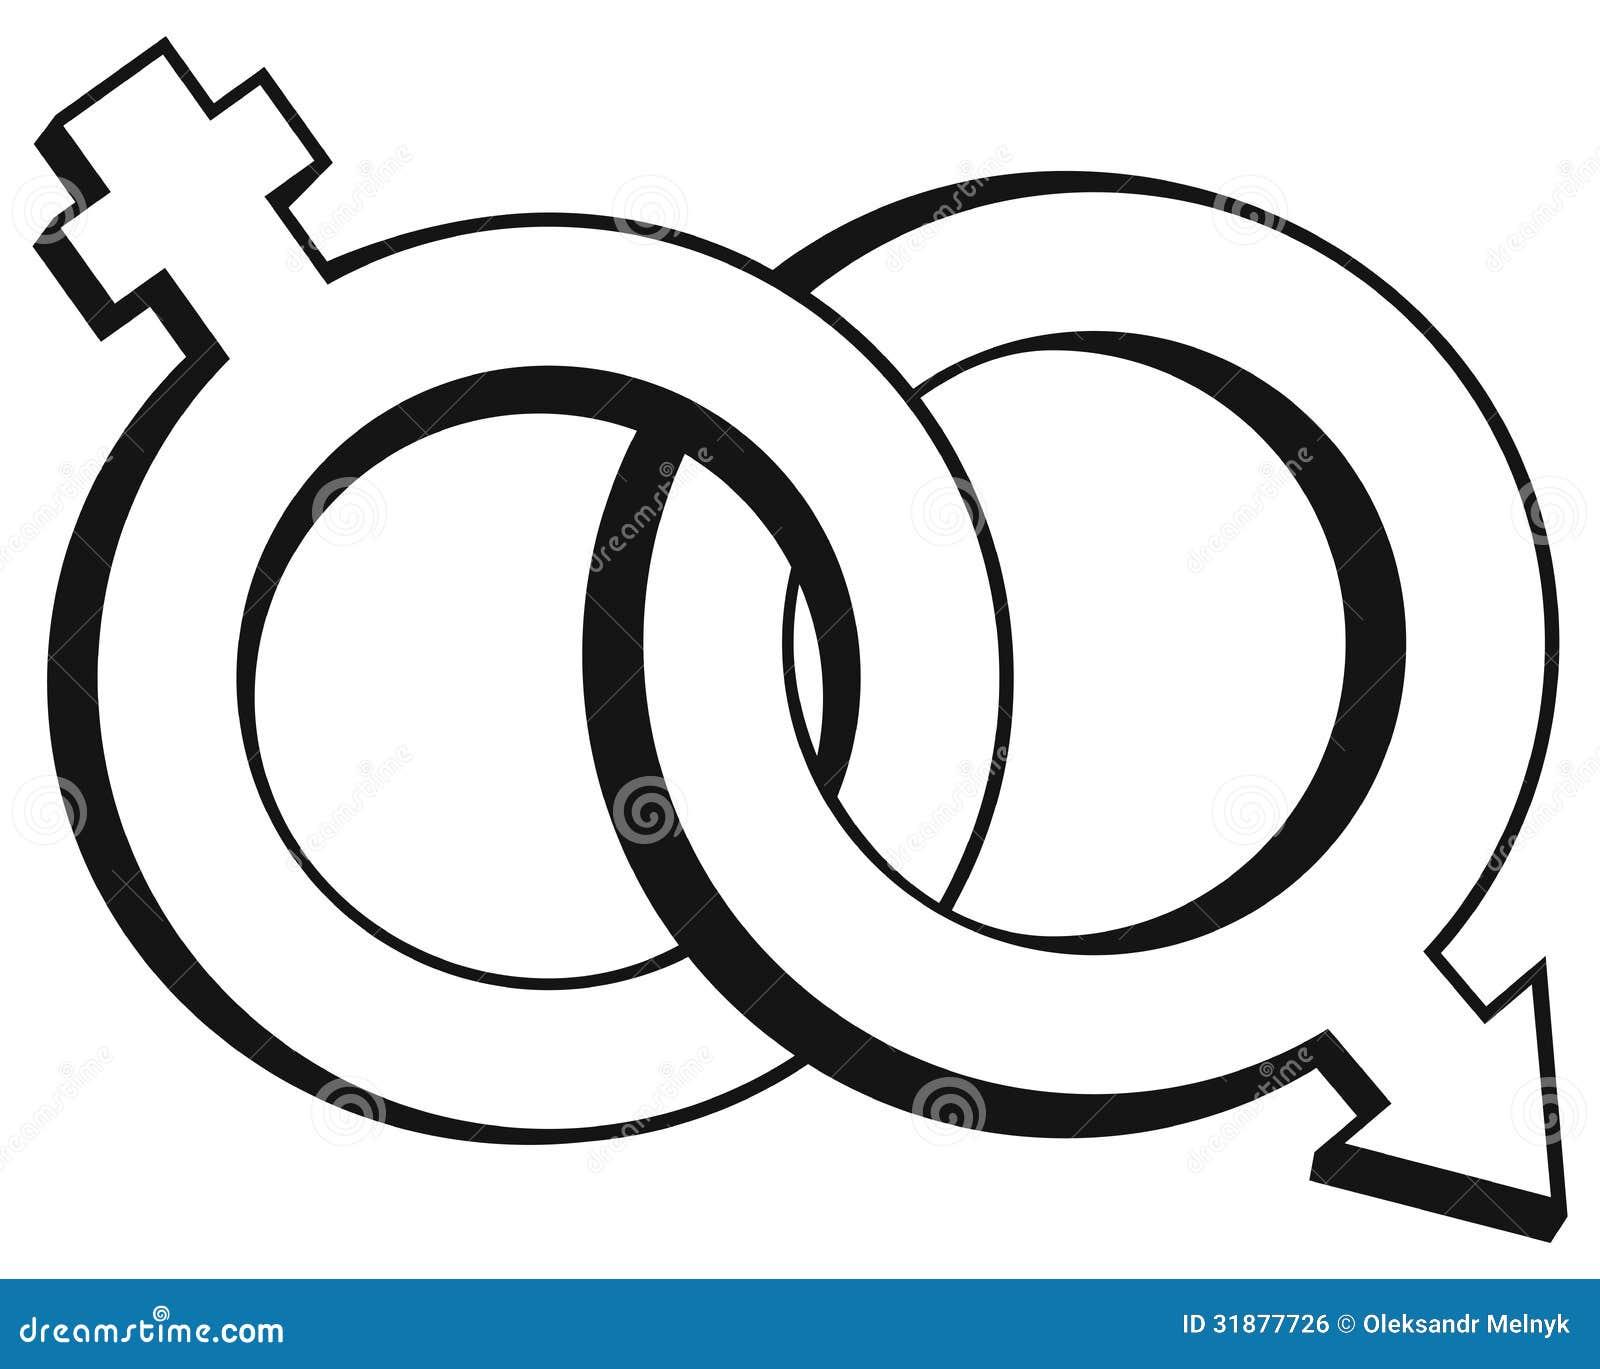 Male And Female Symbols Royalty Free Stock Image - Image: 31877726